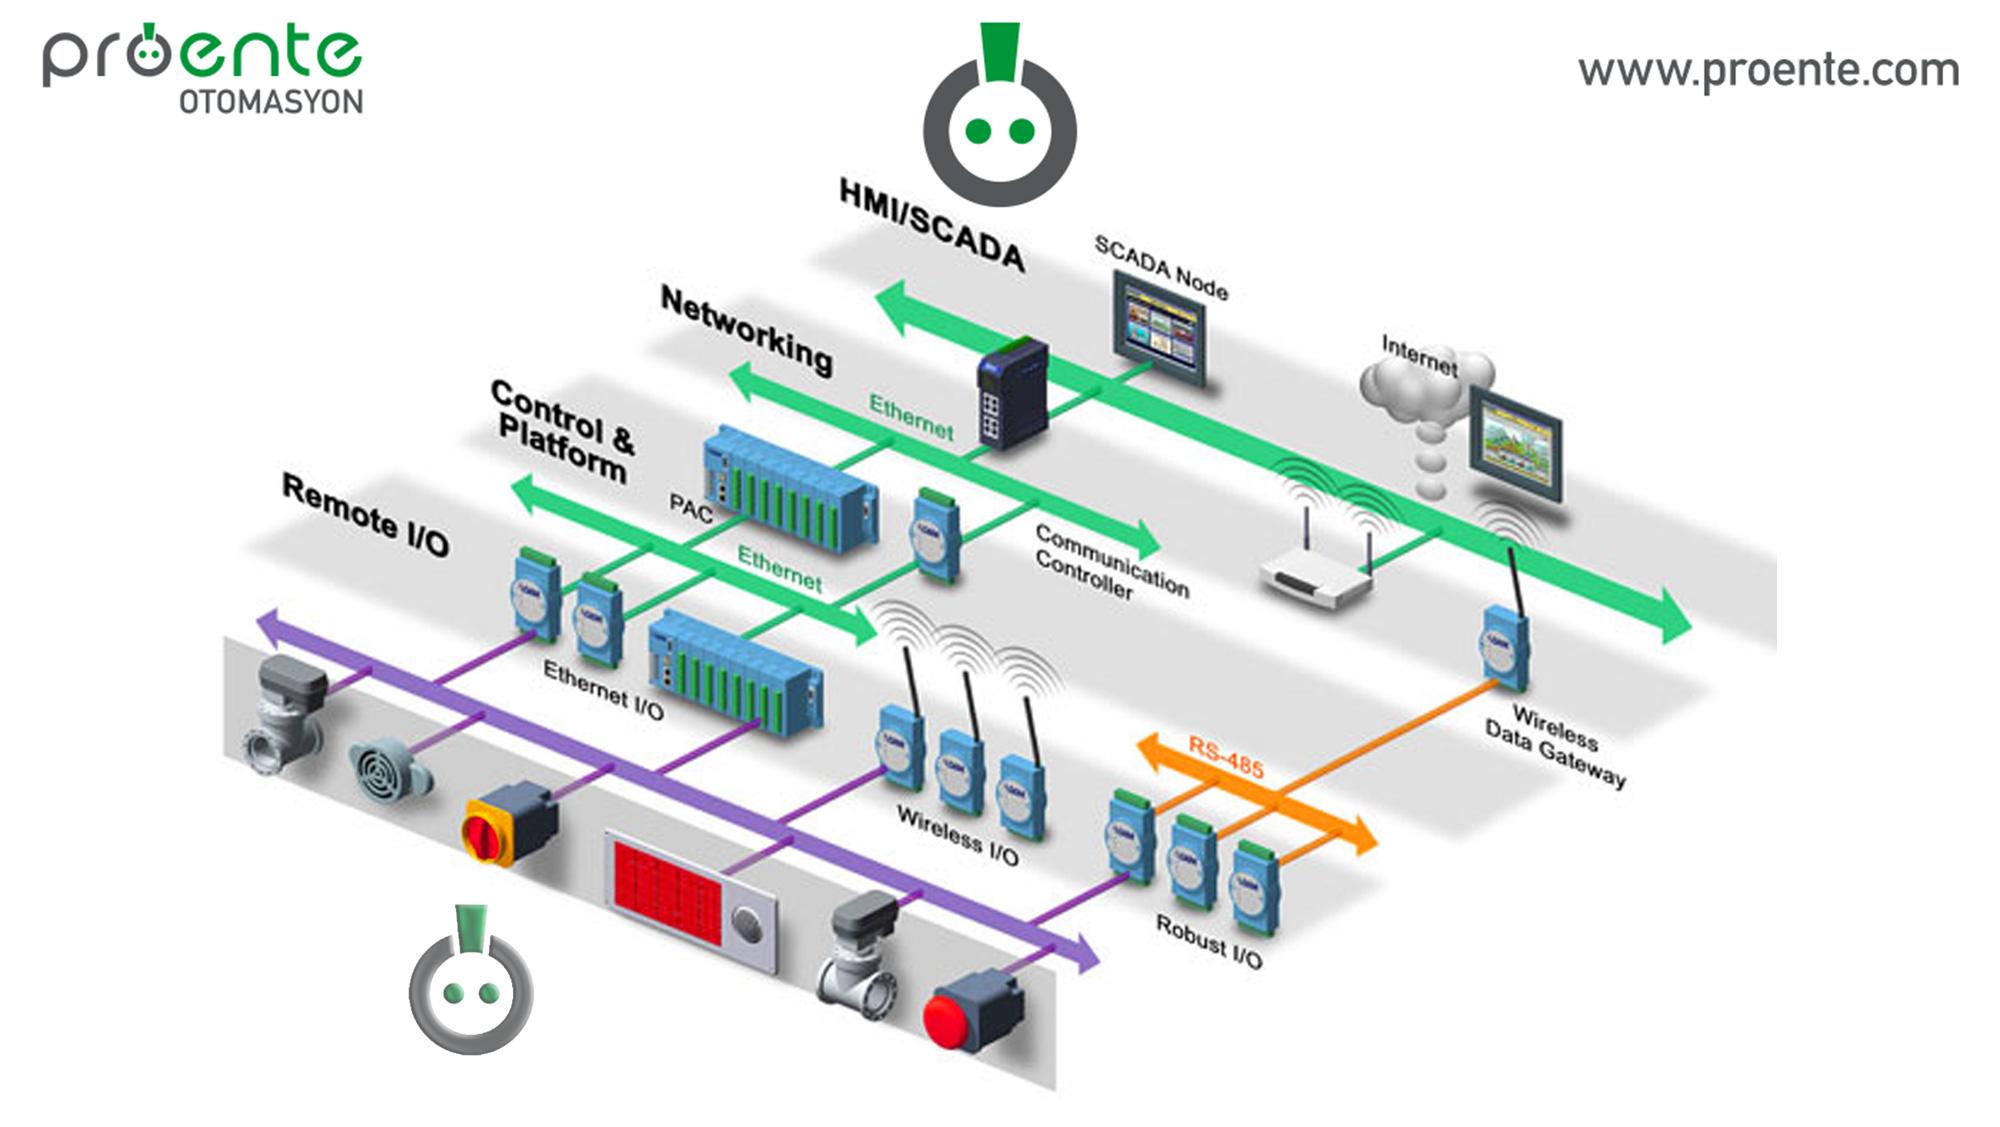 endüstriyel iletişim, endüstriyel iletişim ağı,